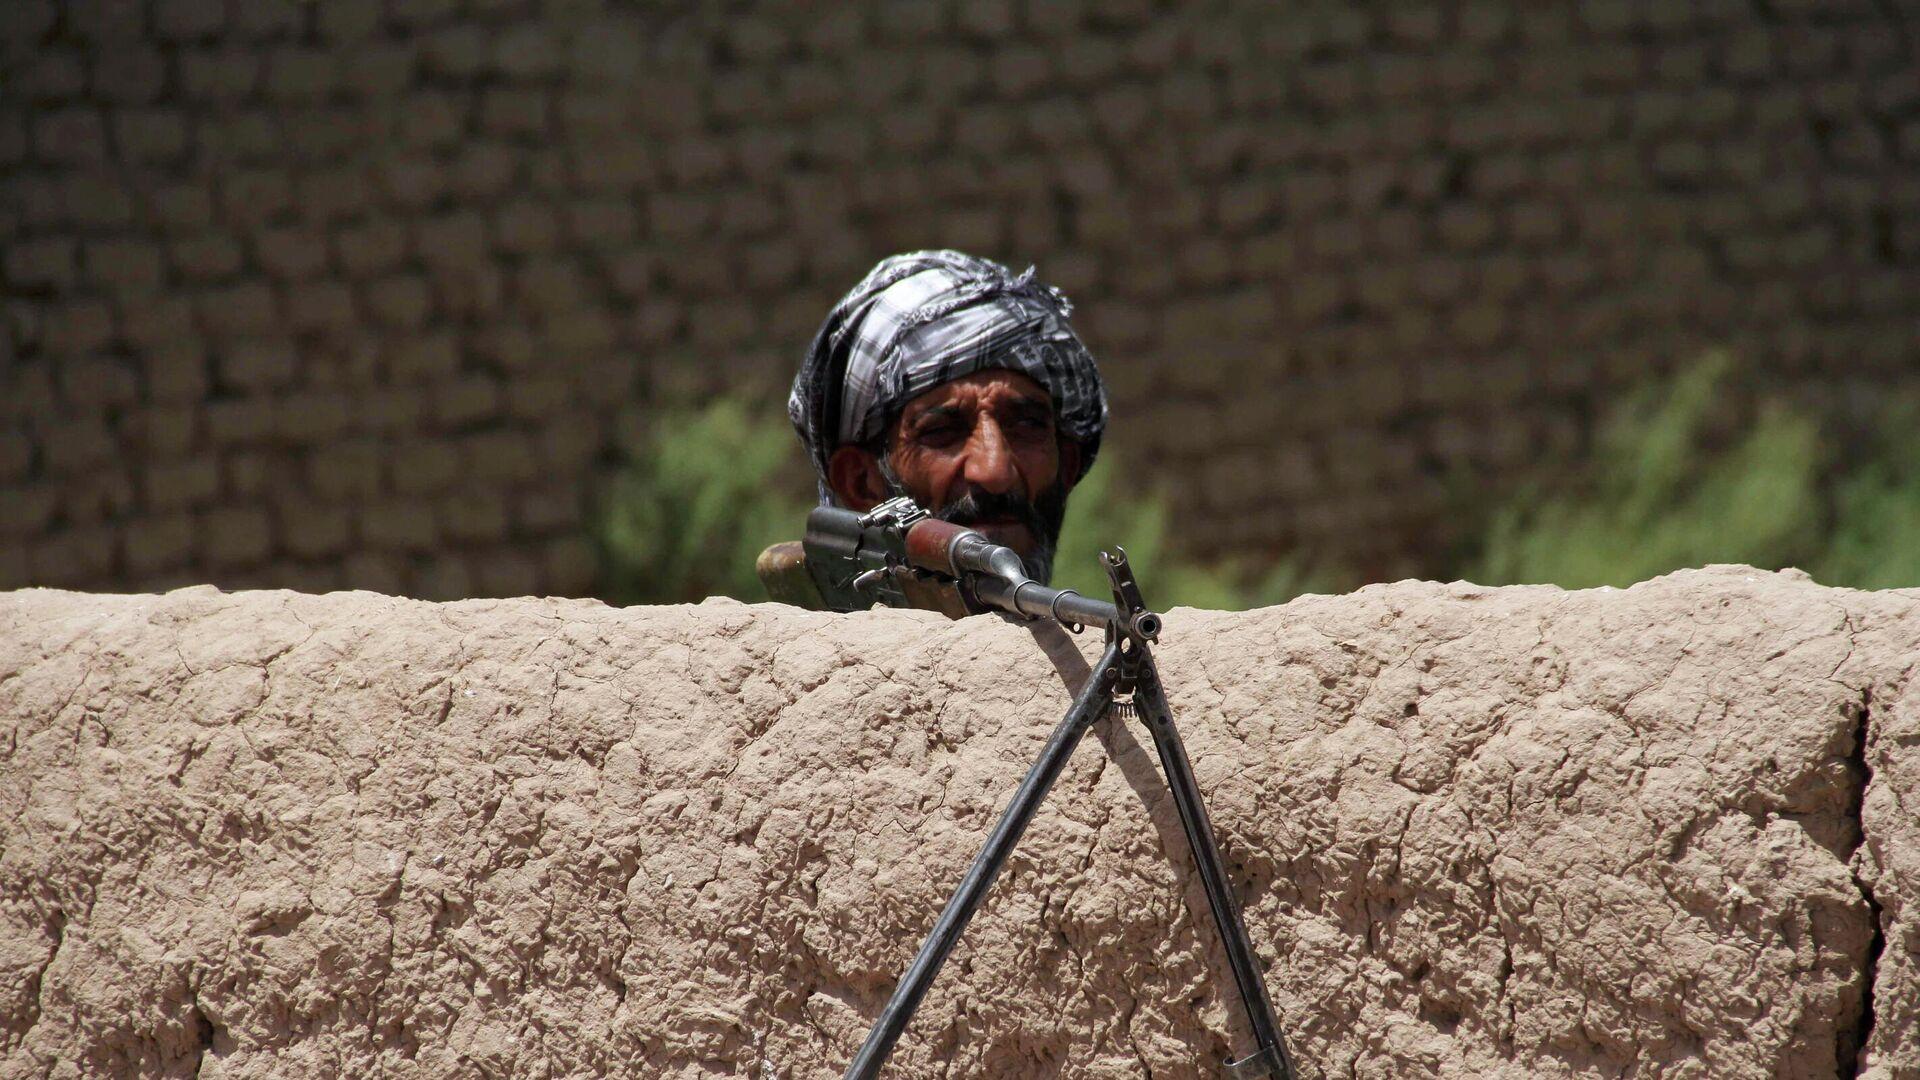 Hombre armado en Afganistán - Sputnik Mundo, 1920, 22.07.2021